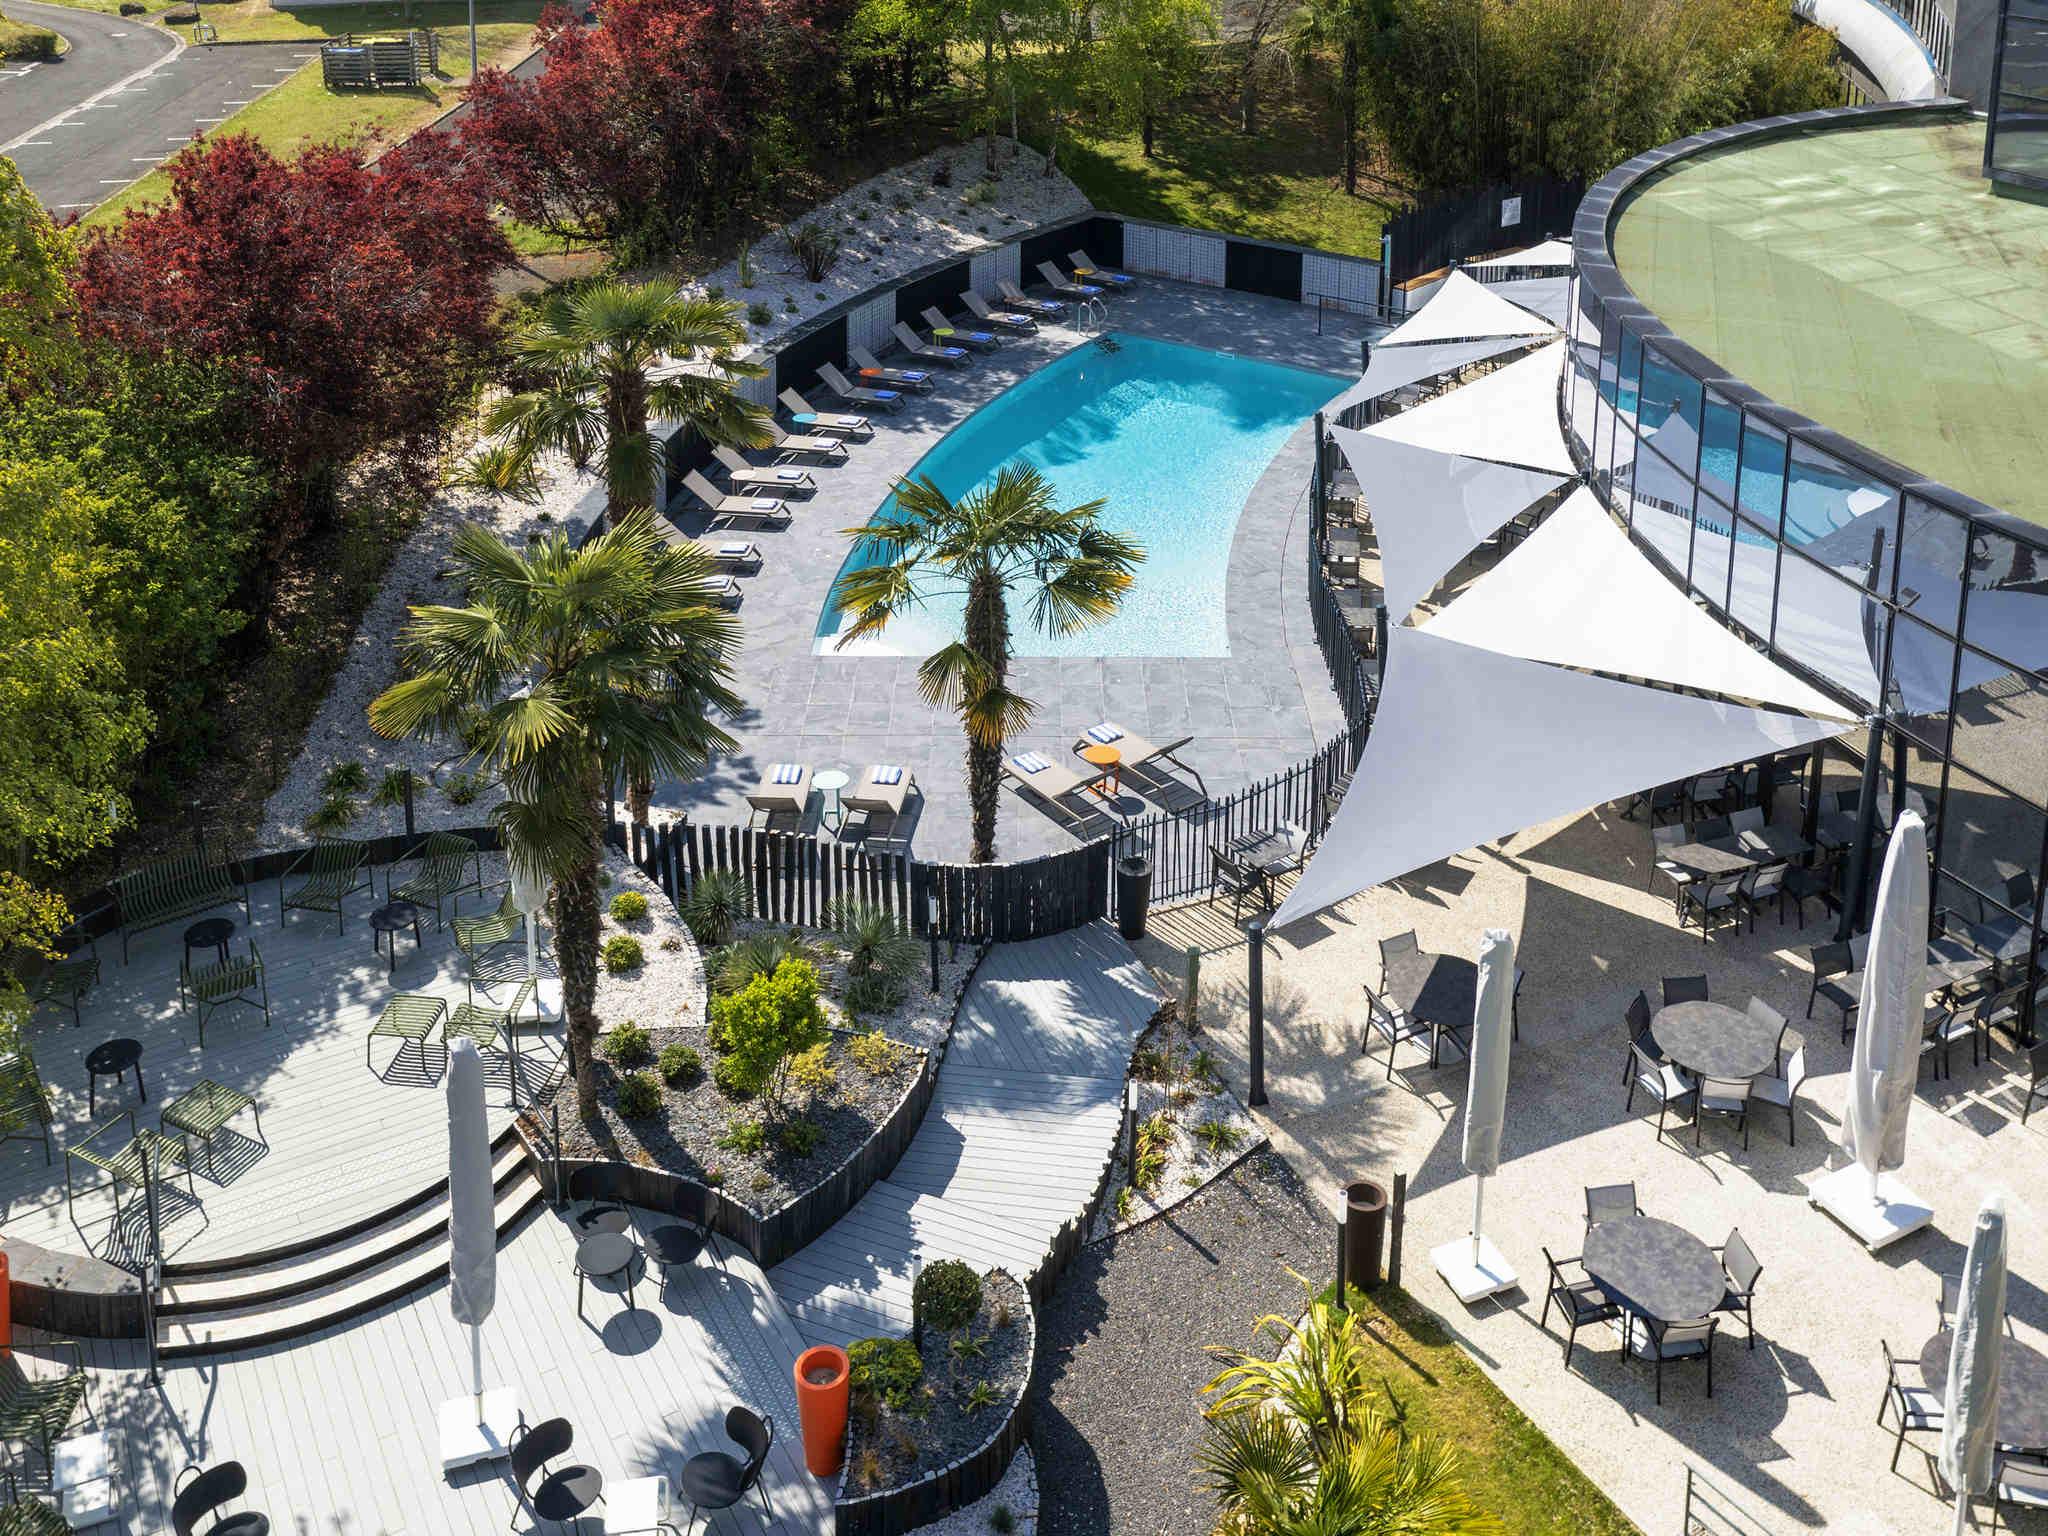 Hotel – Novotel Poitiers Site du Futuroscope